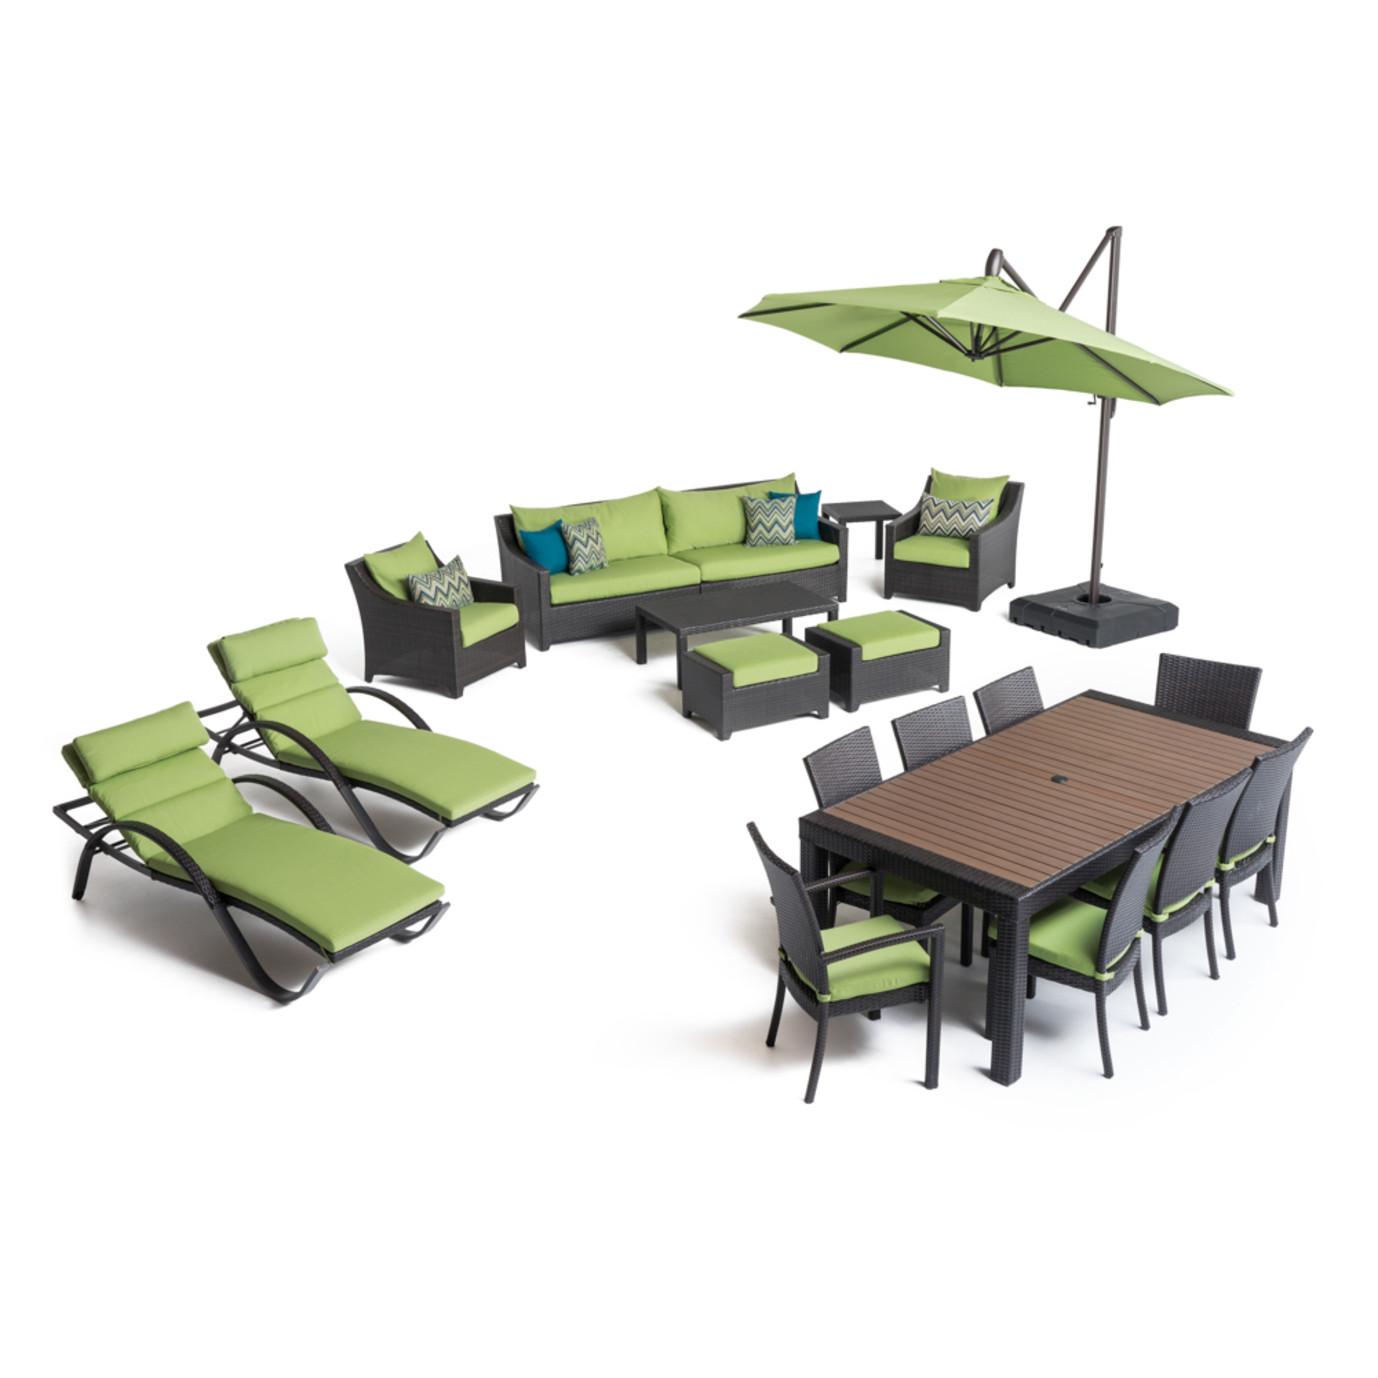 Deco™ 20pc Outdoor Estate Set - Ginkgo Green